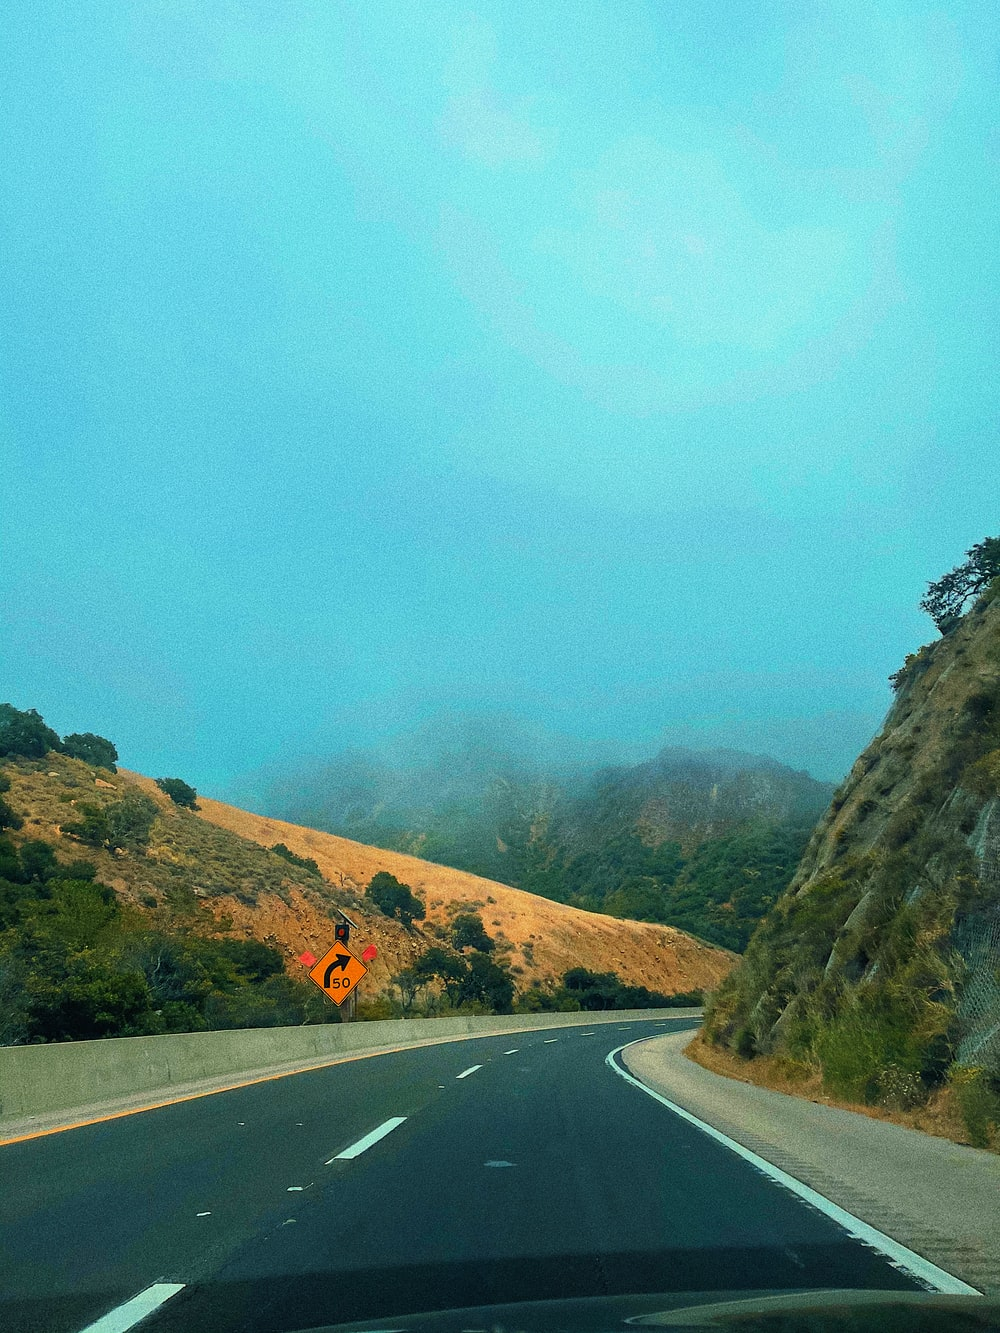 gray asphalt road near green mountain during daytime